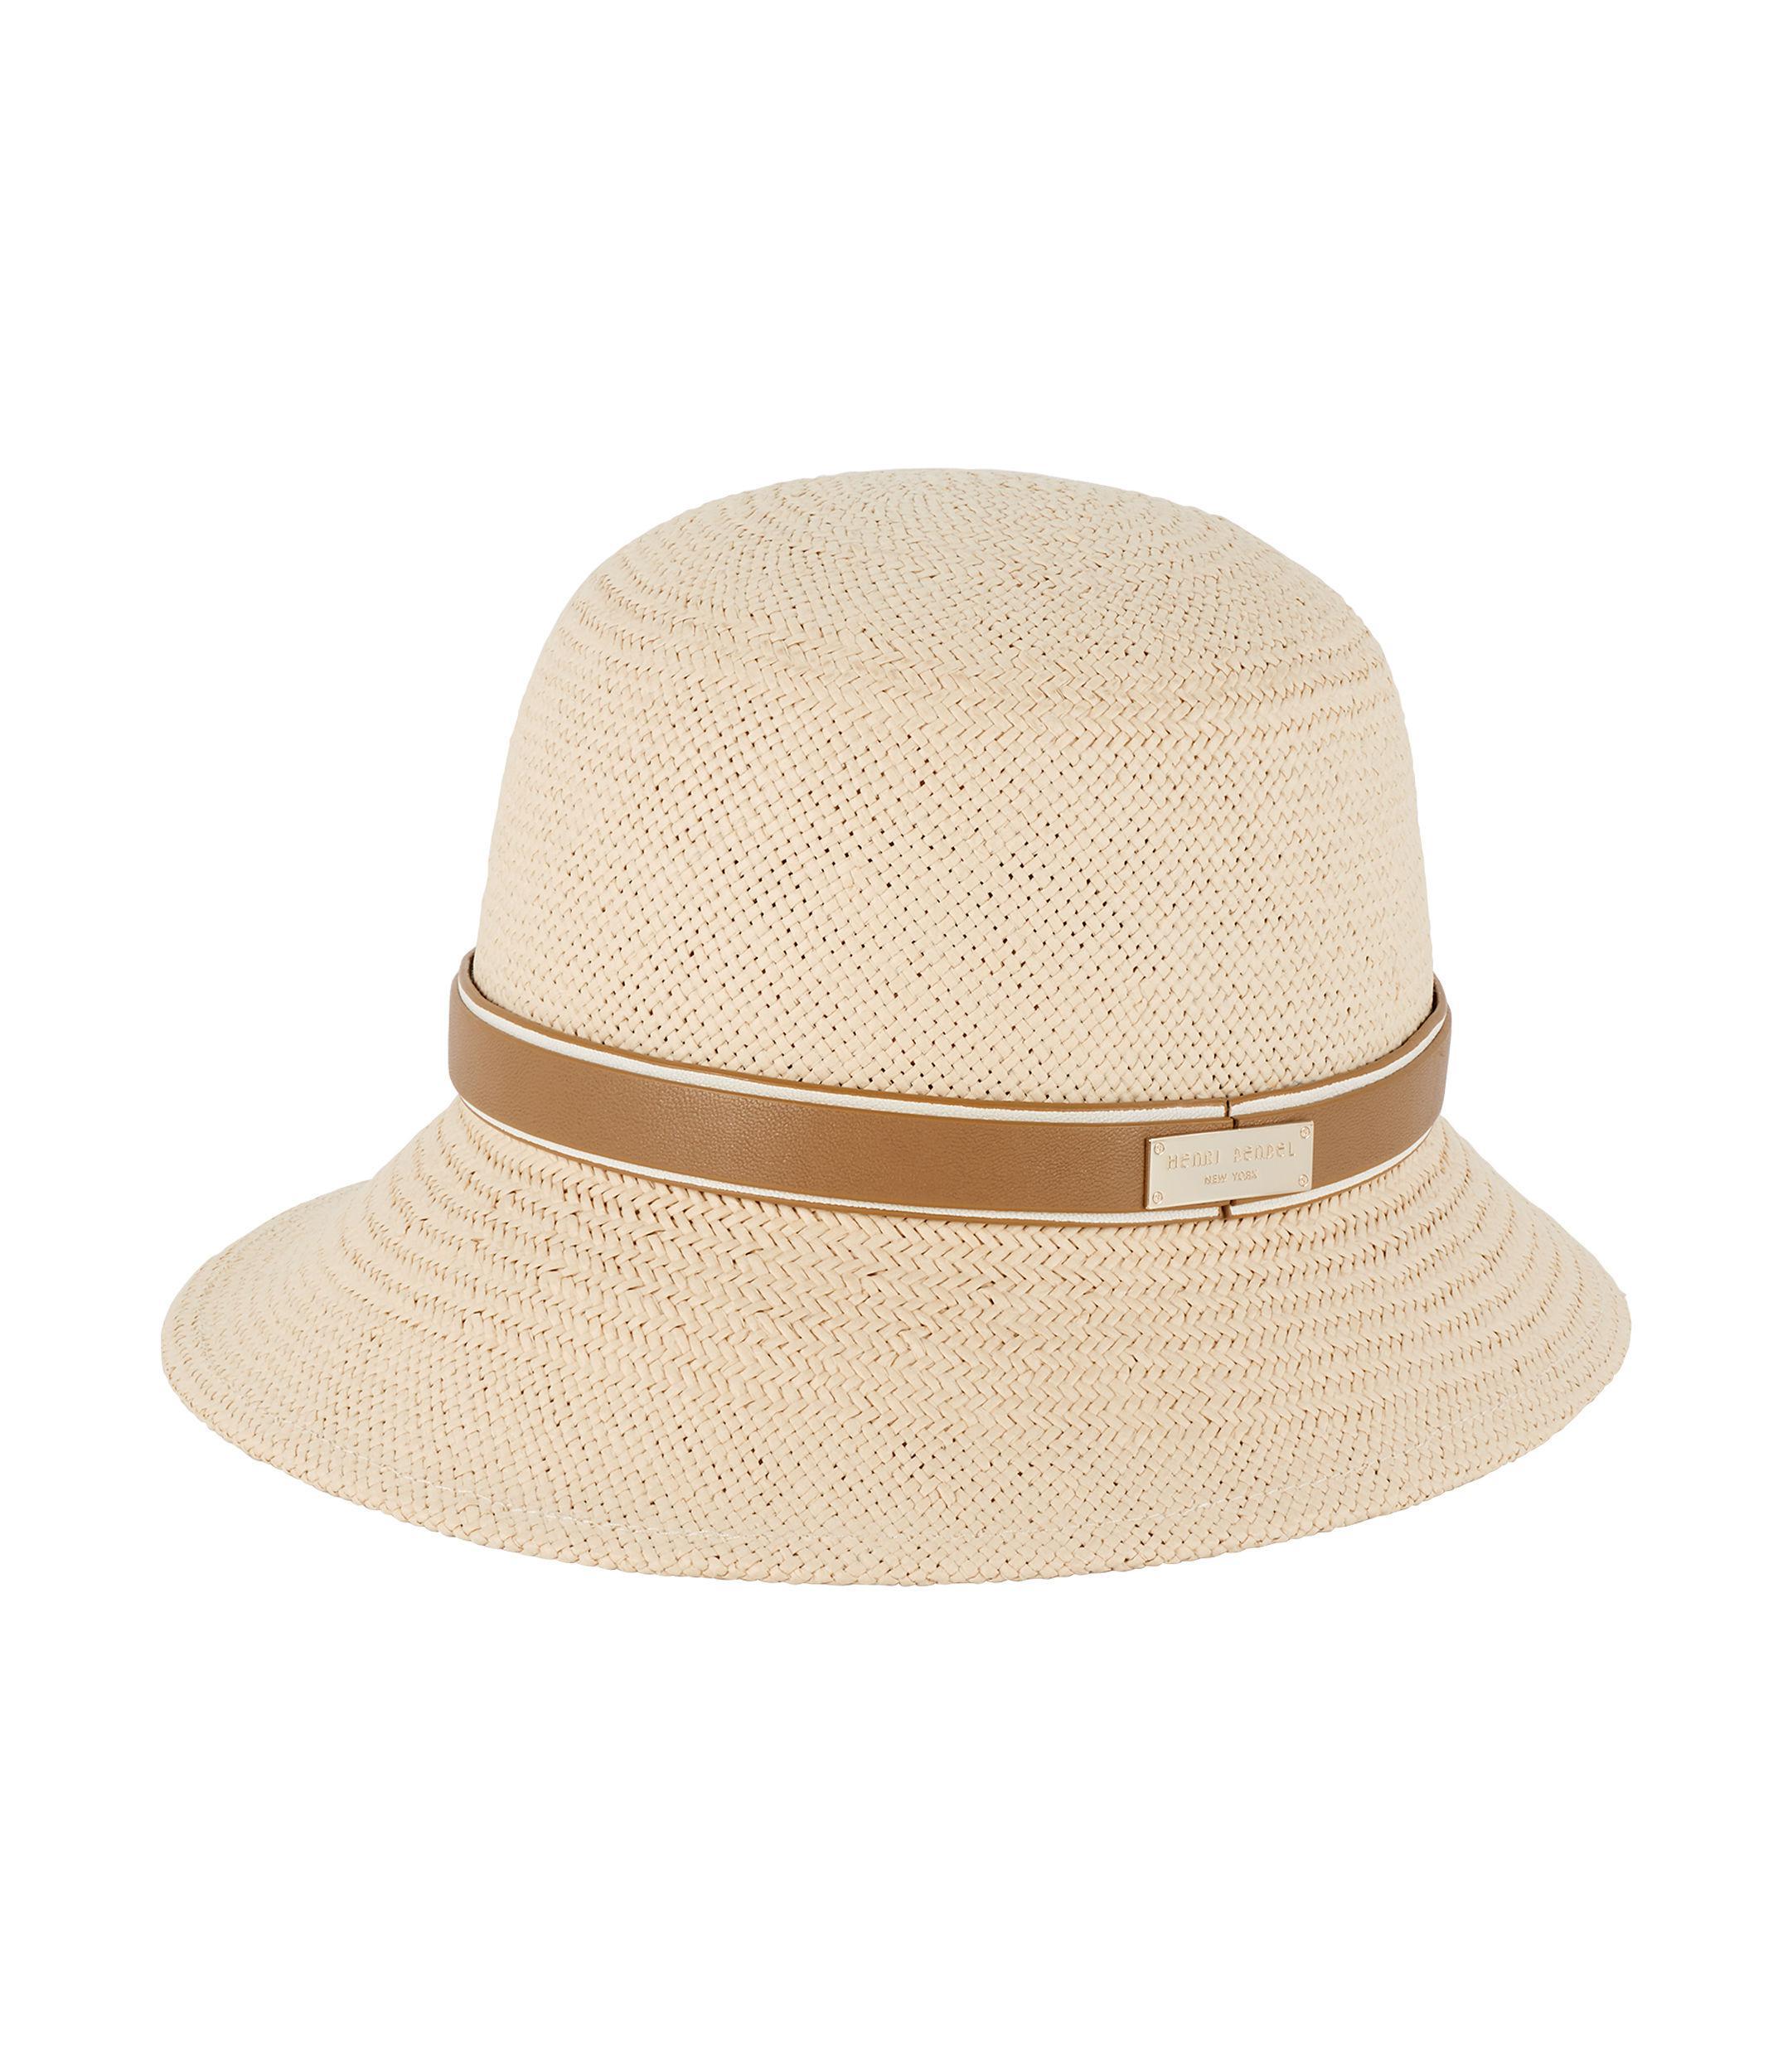 4020afcfcc6 Lyst - Henri Bendel Meadow Straw Hat in Natural